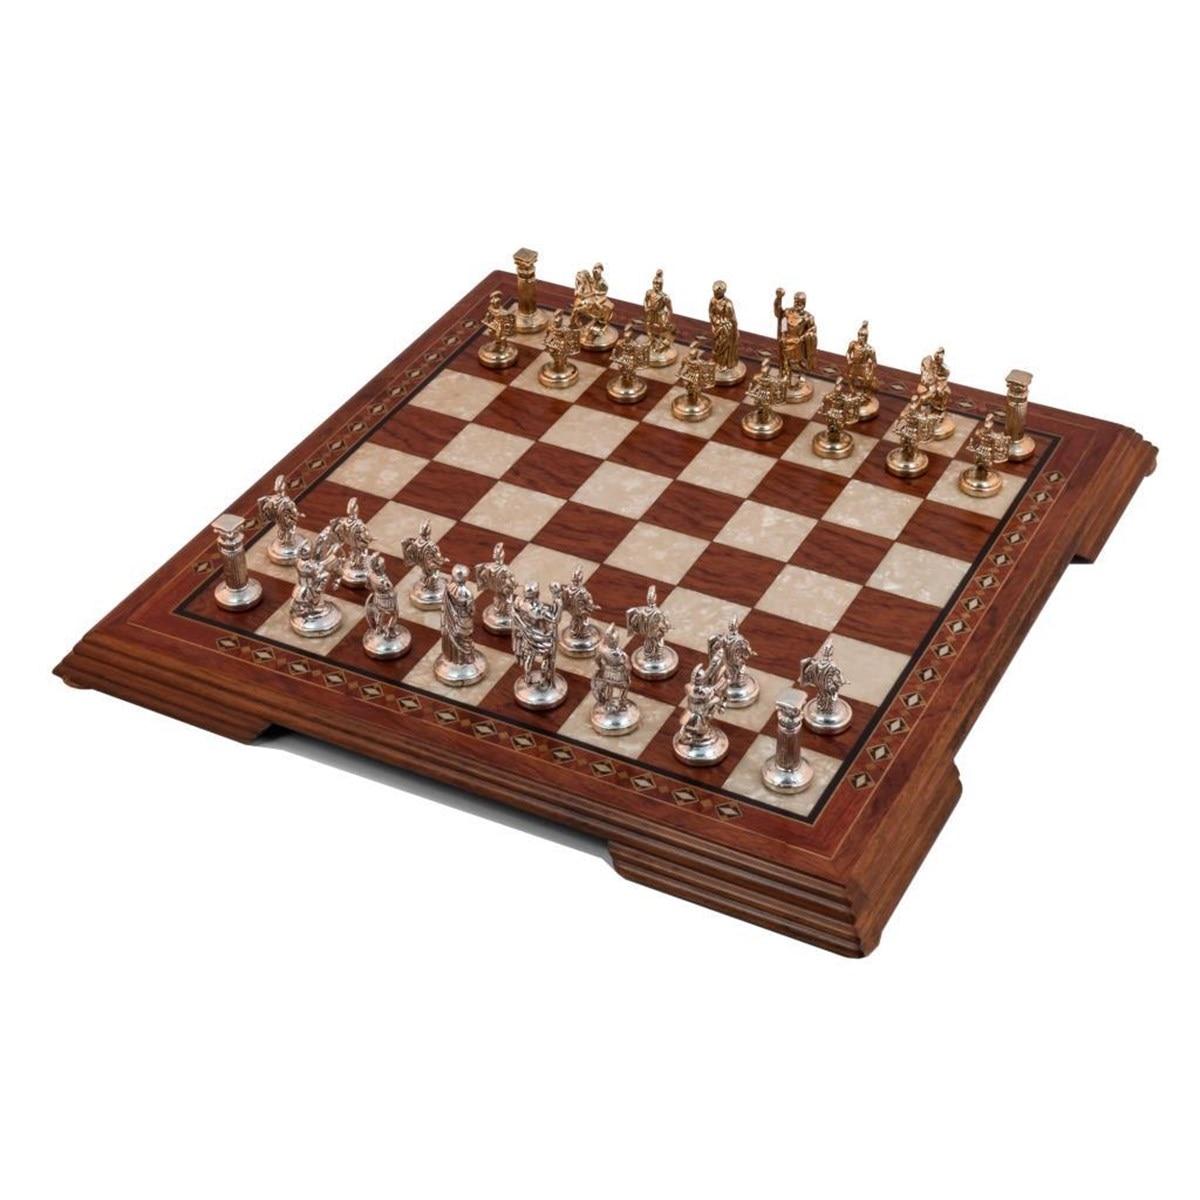 Luxury Rosewood Chess Game Set - Mosaic Engraved Large Solid Wood Chessboard & Metal Figures - Backgammon - Rummy Oyunlar Gift